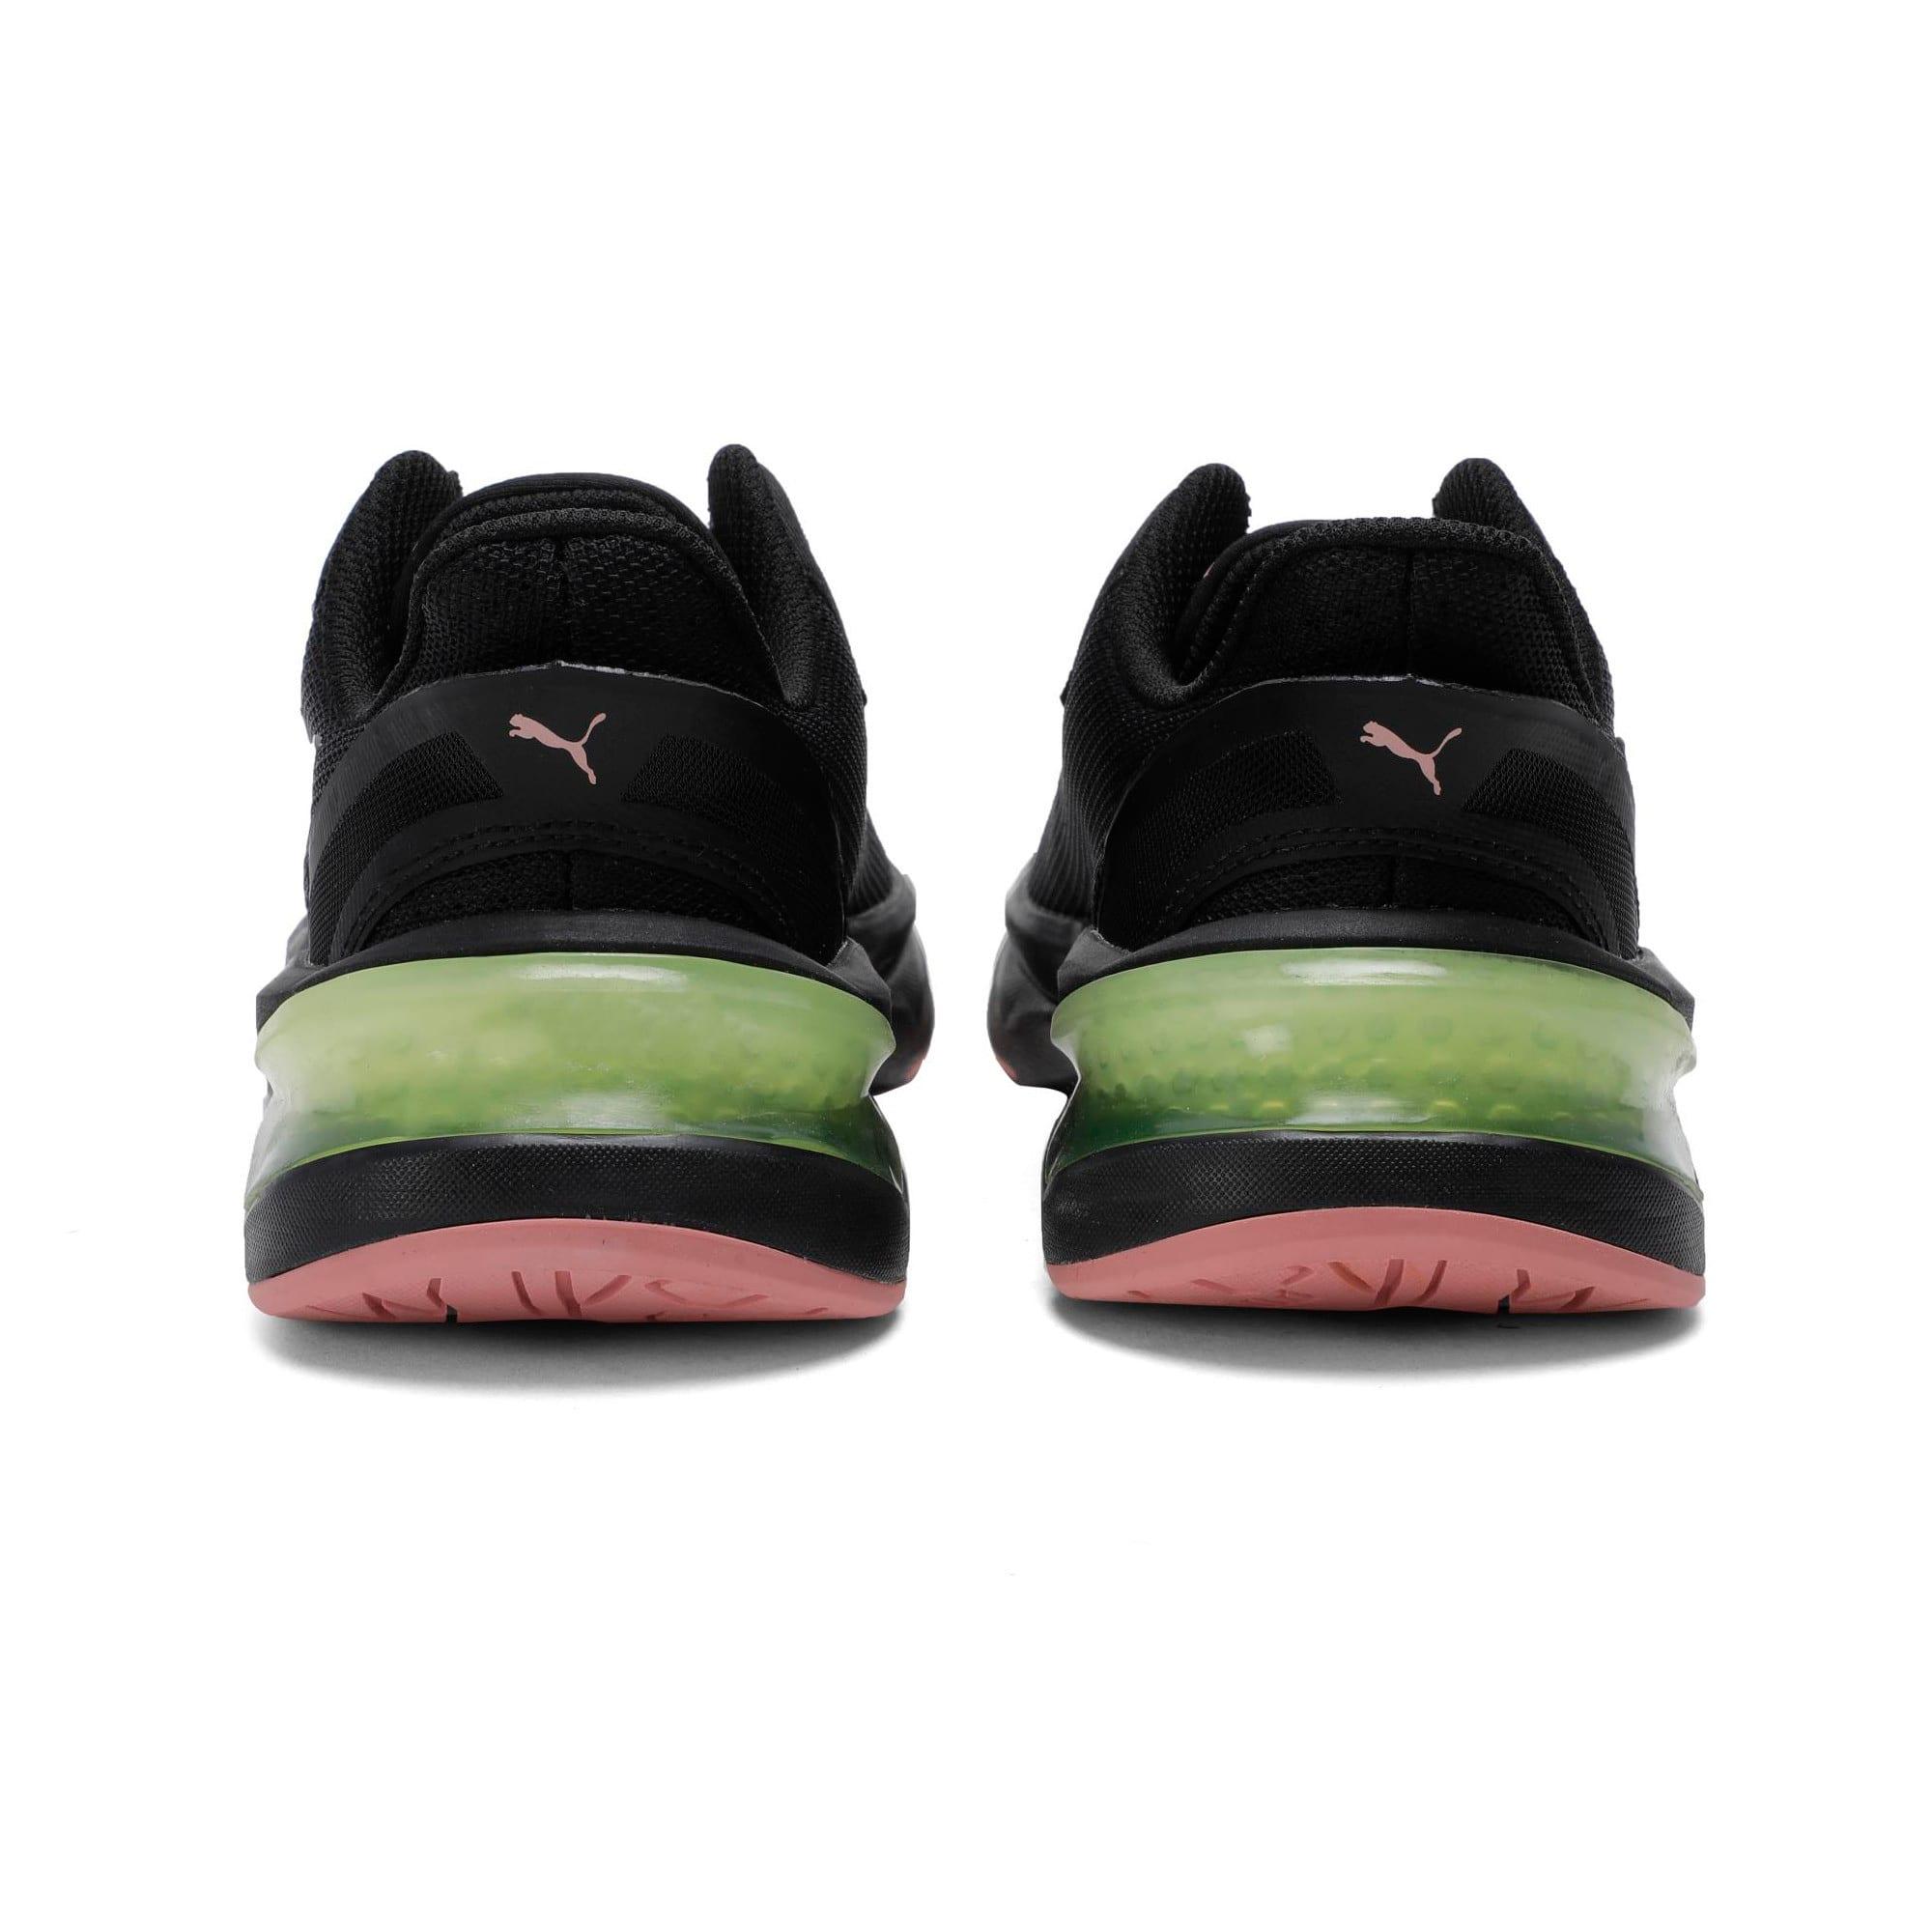 Thumbnail 7 of LQDCELL Shatter XT Women's Training Shoes, Puma Black-Yellow Alert, medium-IND